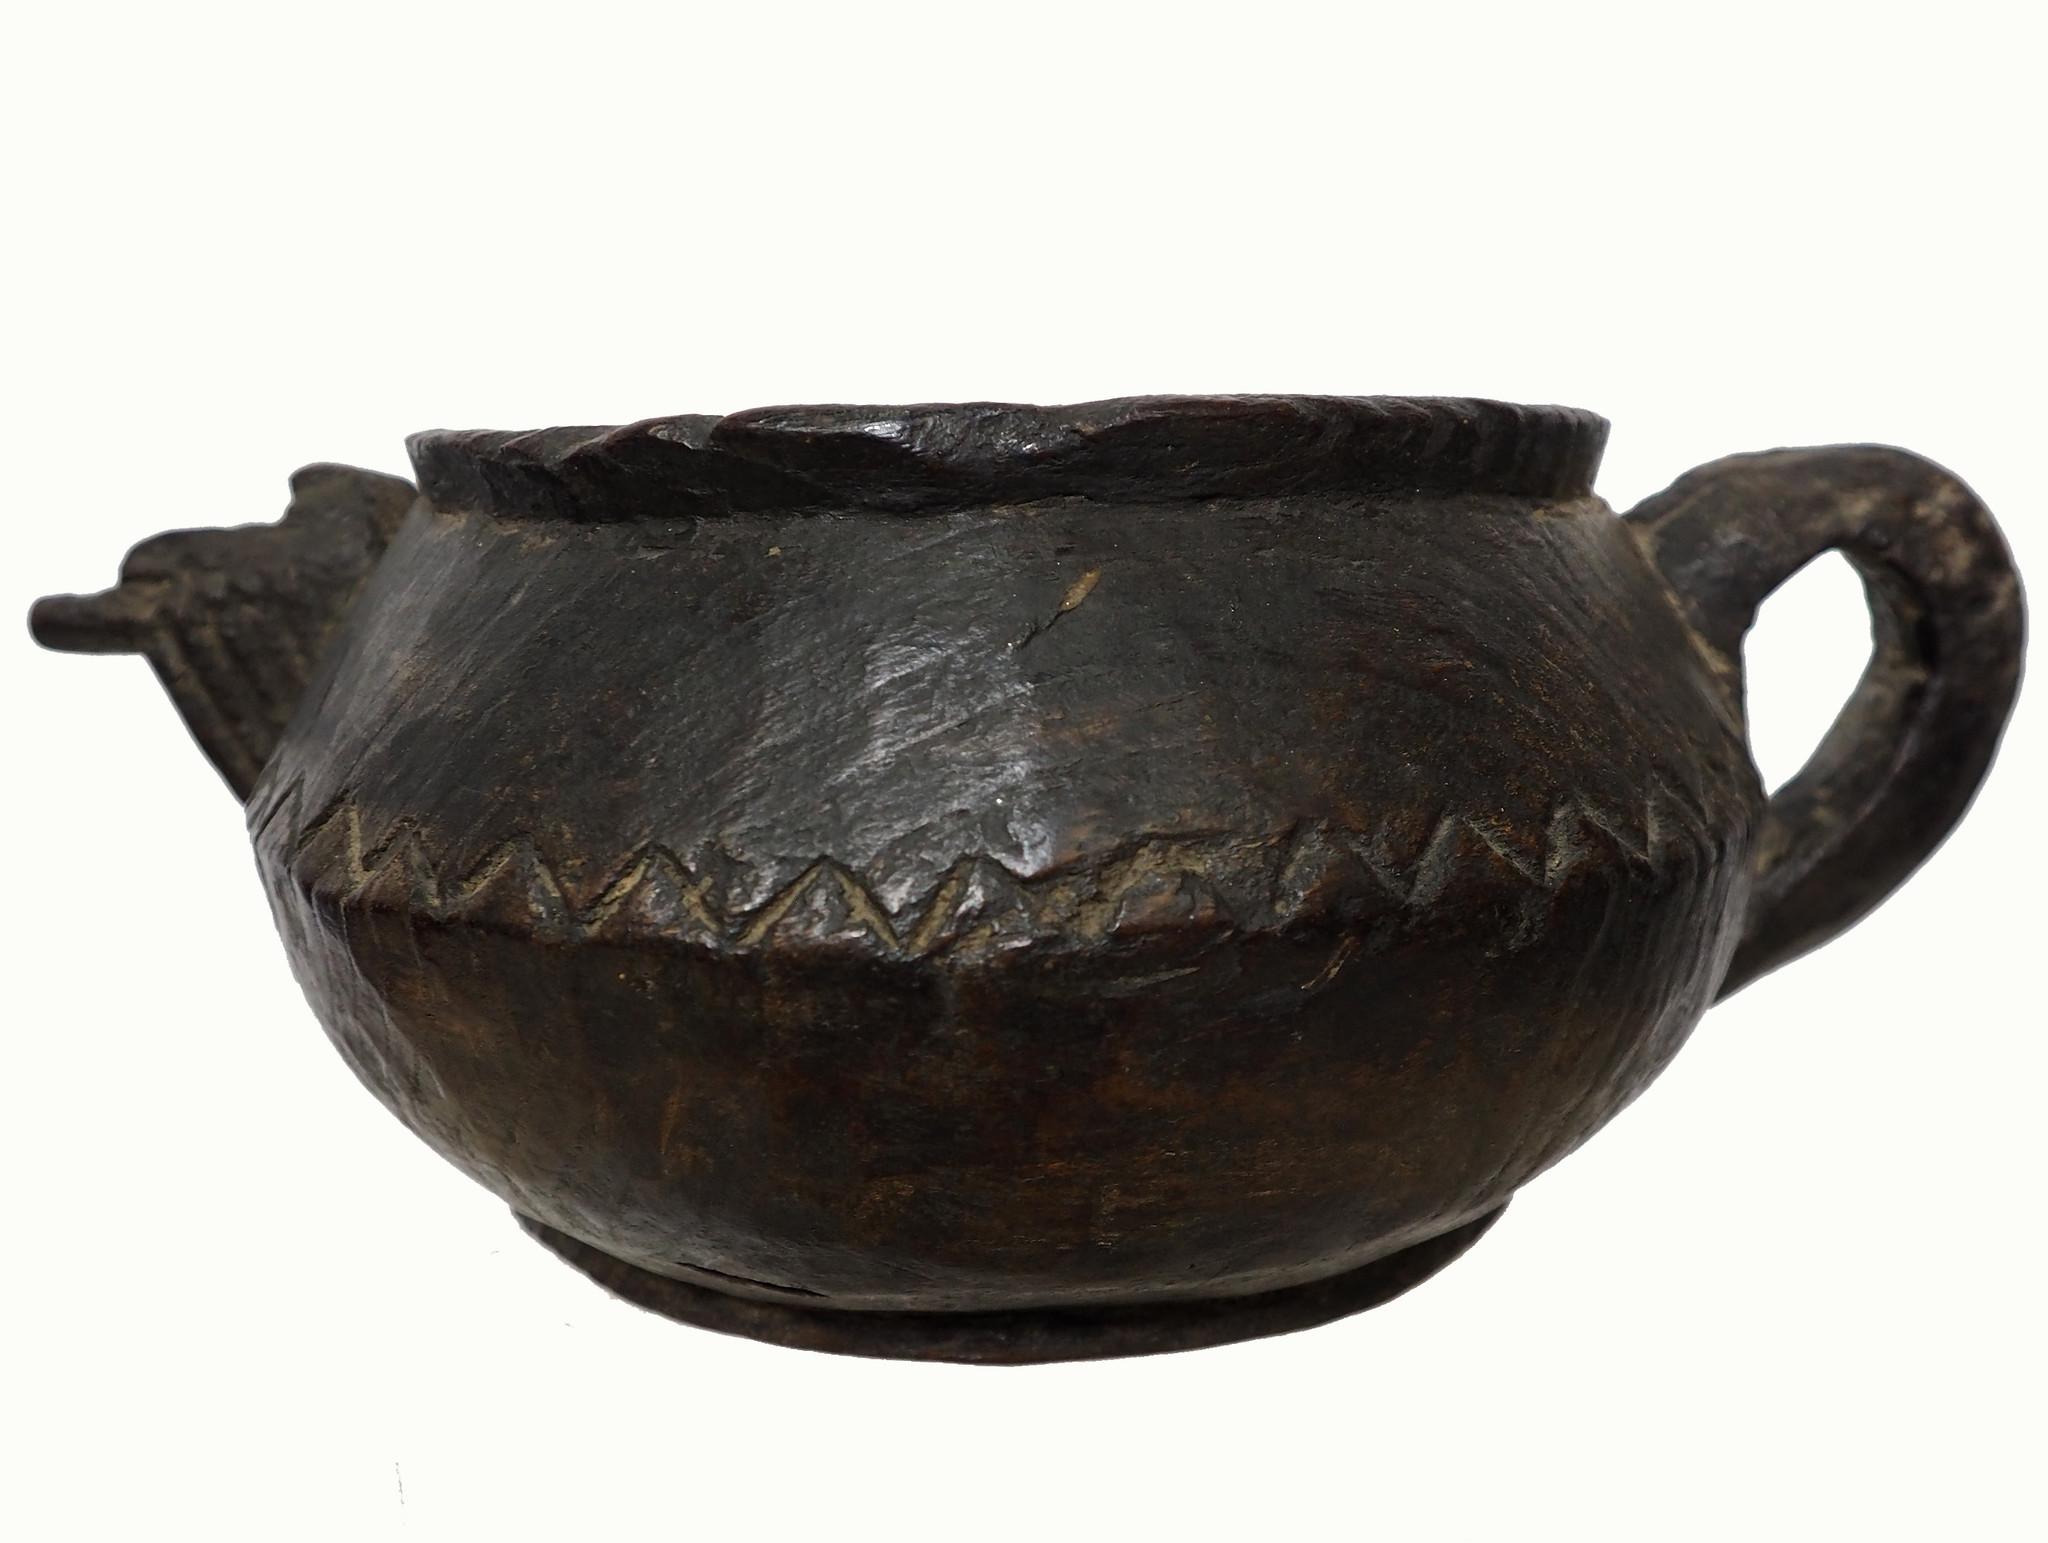 Antique wooden bowl  Nuristan Afghanistan No:19/1